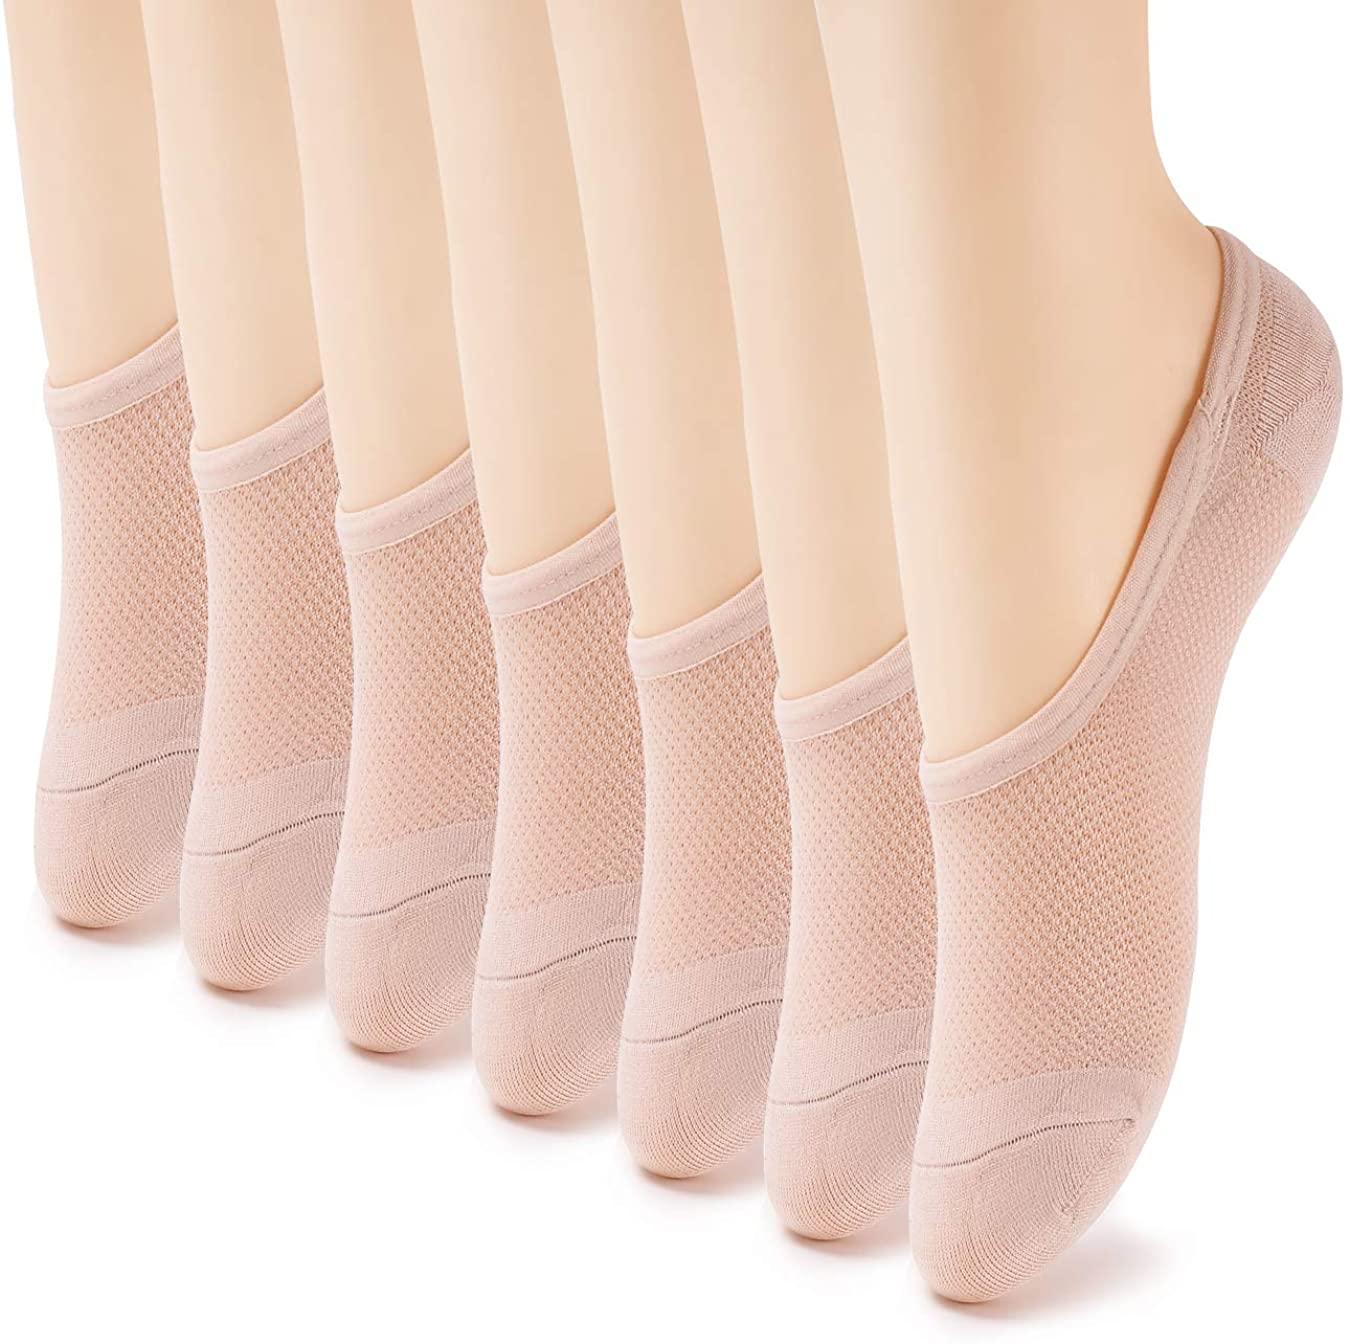 7 Pack No Show Socks Women No Show Liner Socks Womens Thin Low Cut Casual Socks Non Slip